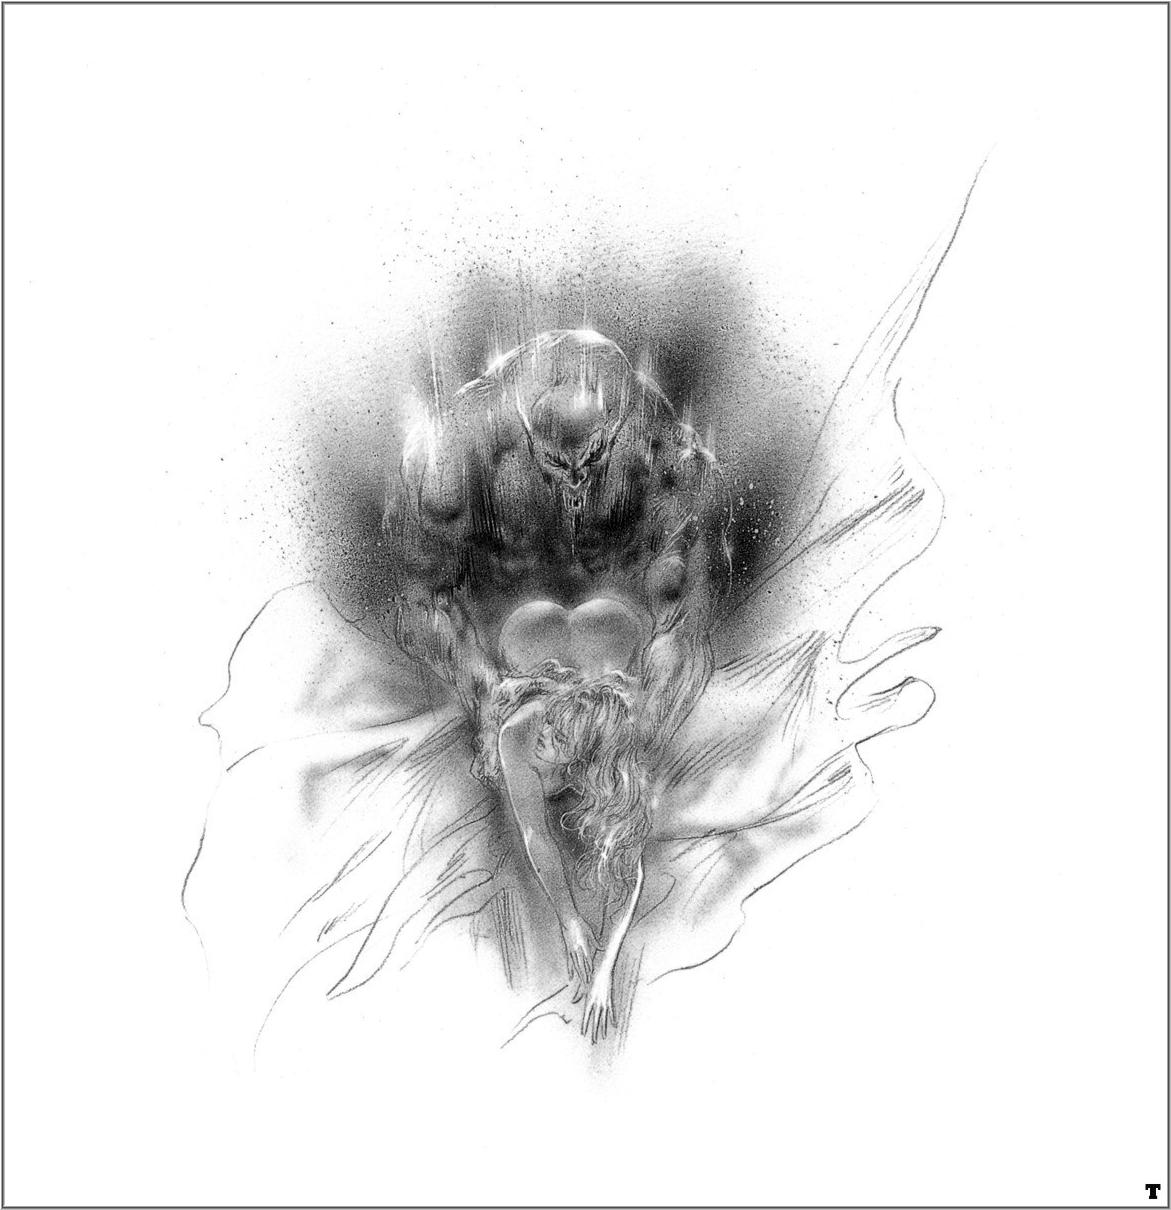 Рисунок карандашом хуй 4 фотография